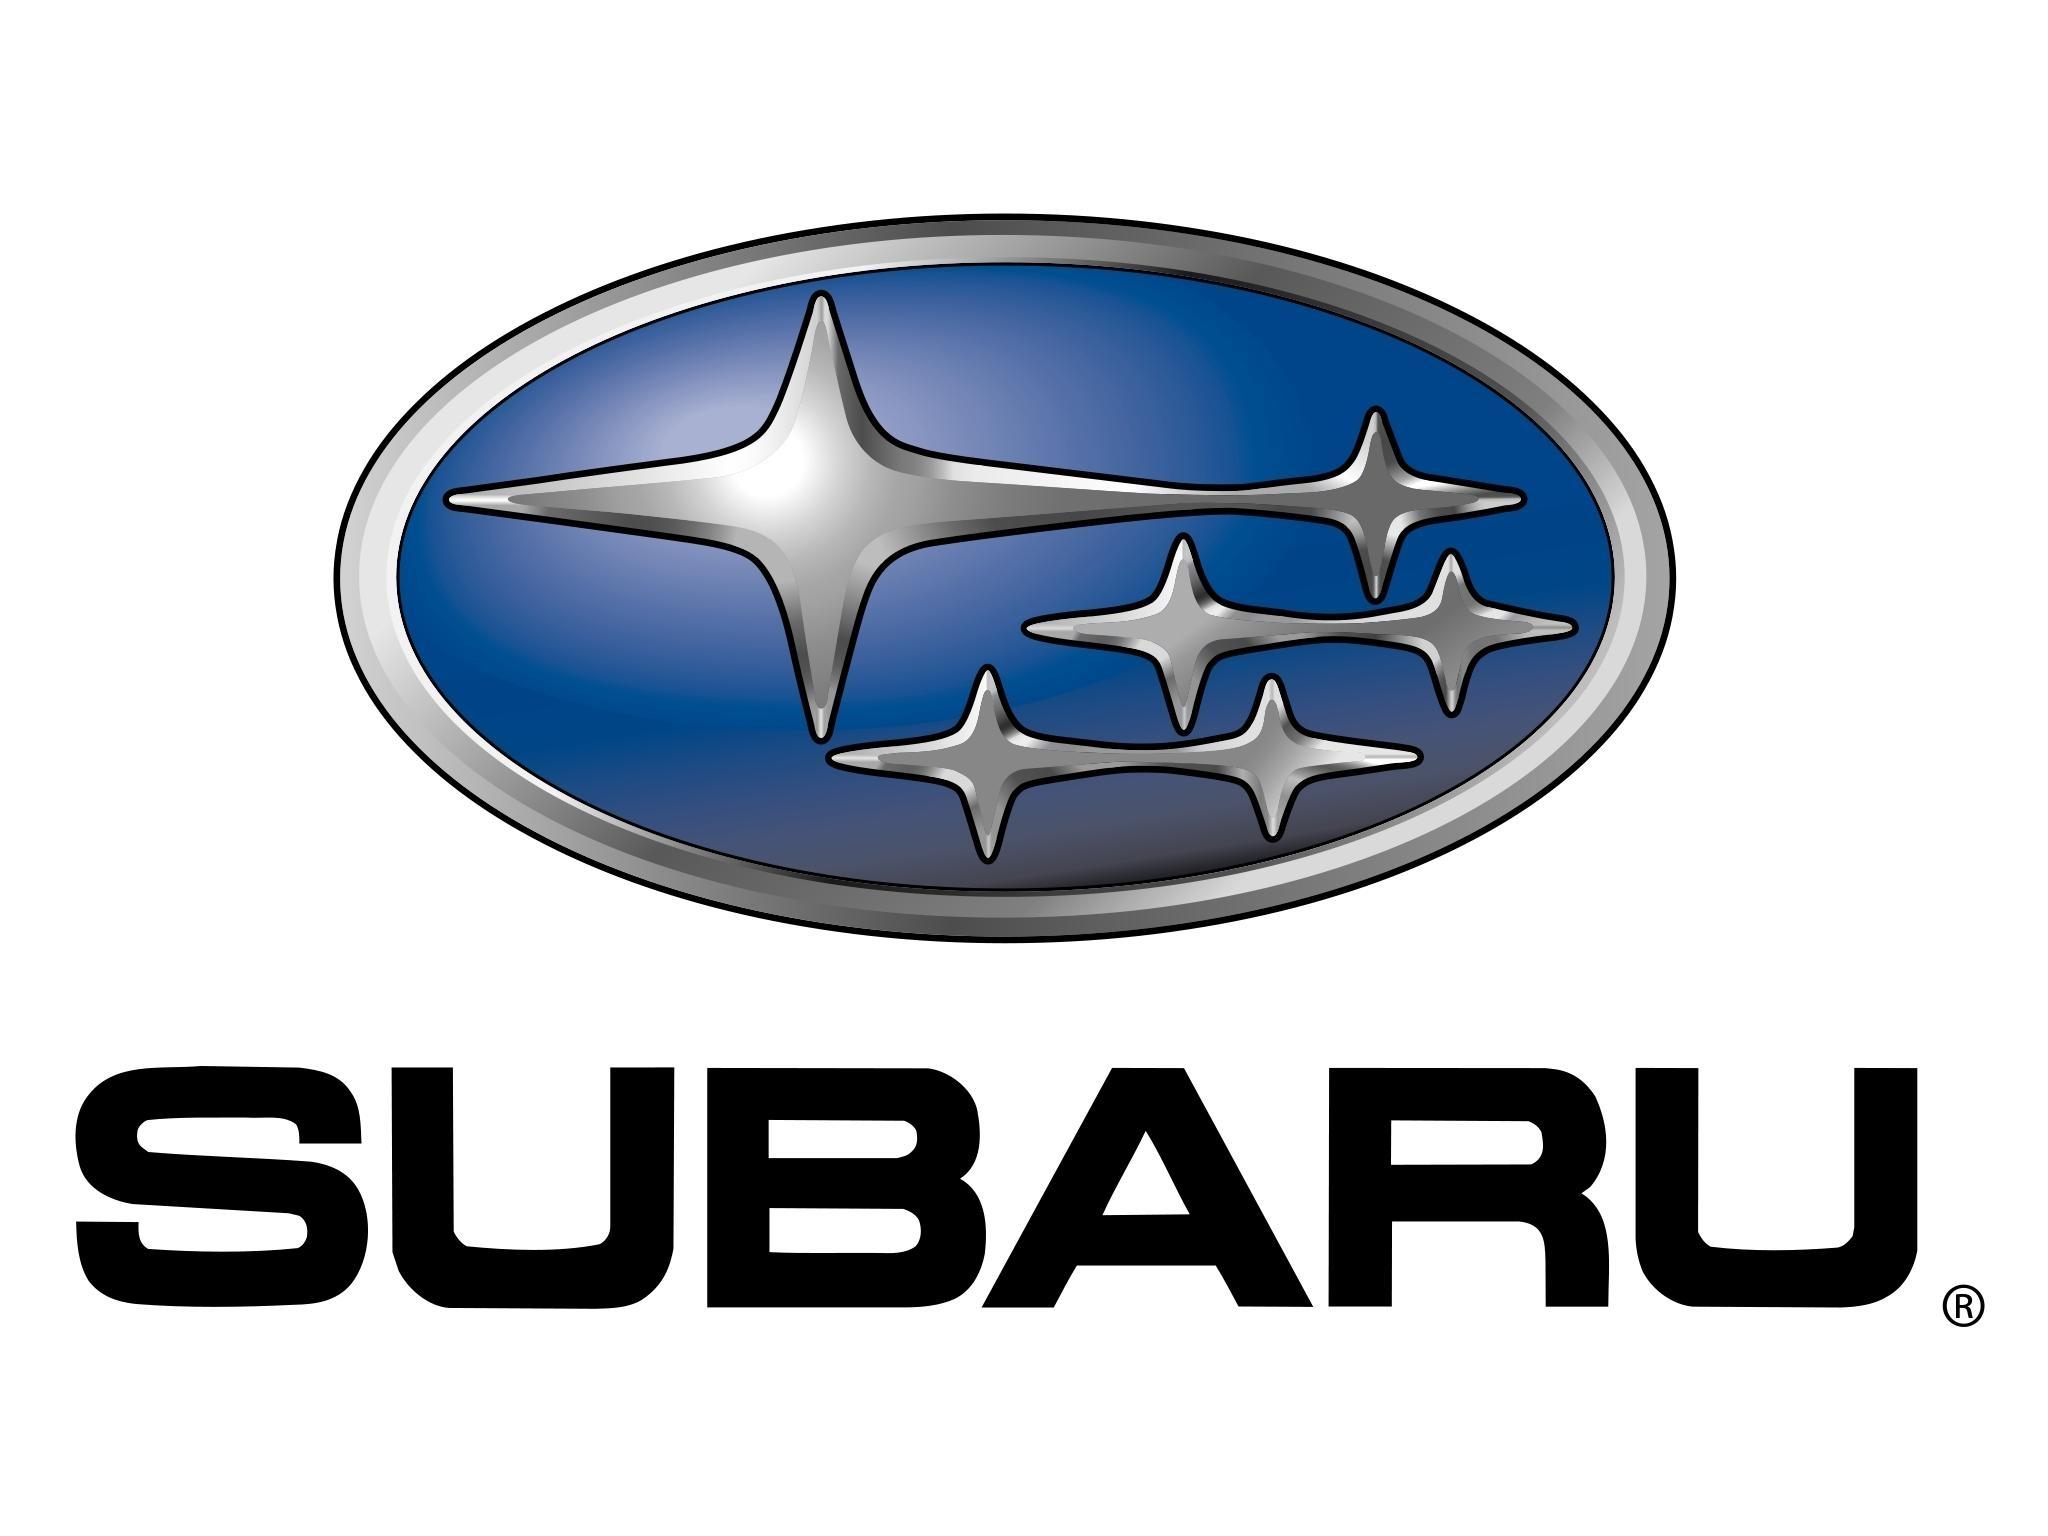 Who Owns Subaru >> Wallpaper Car Logo Company Subaru Brand Symbol